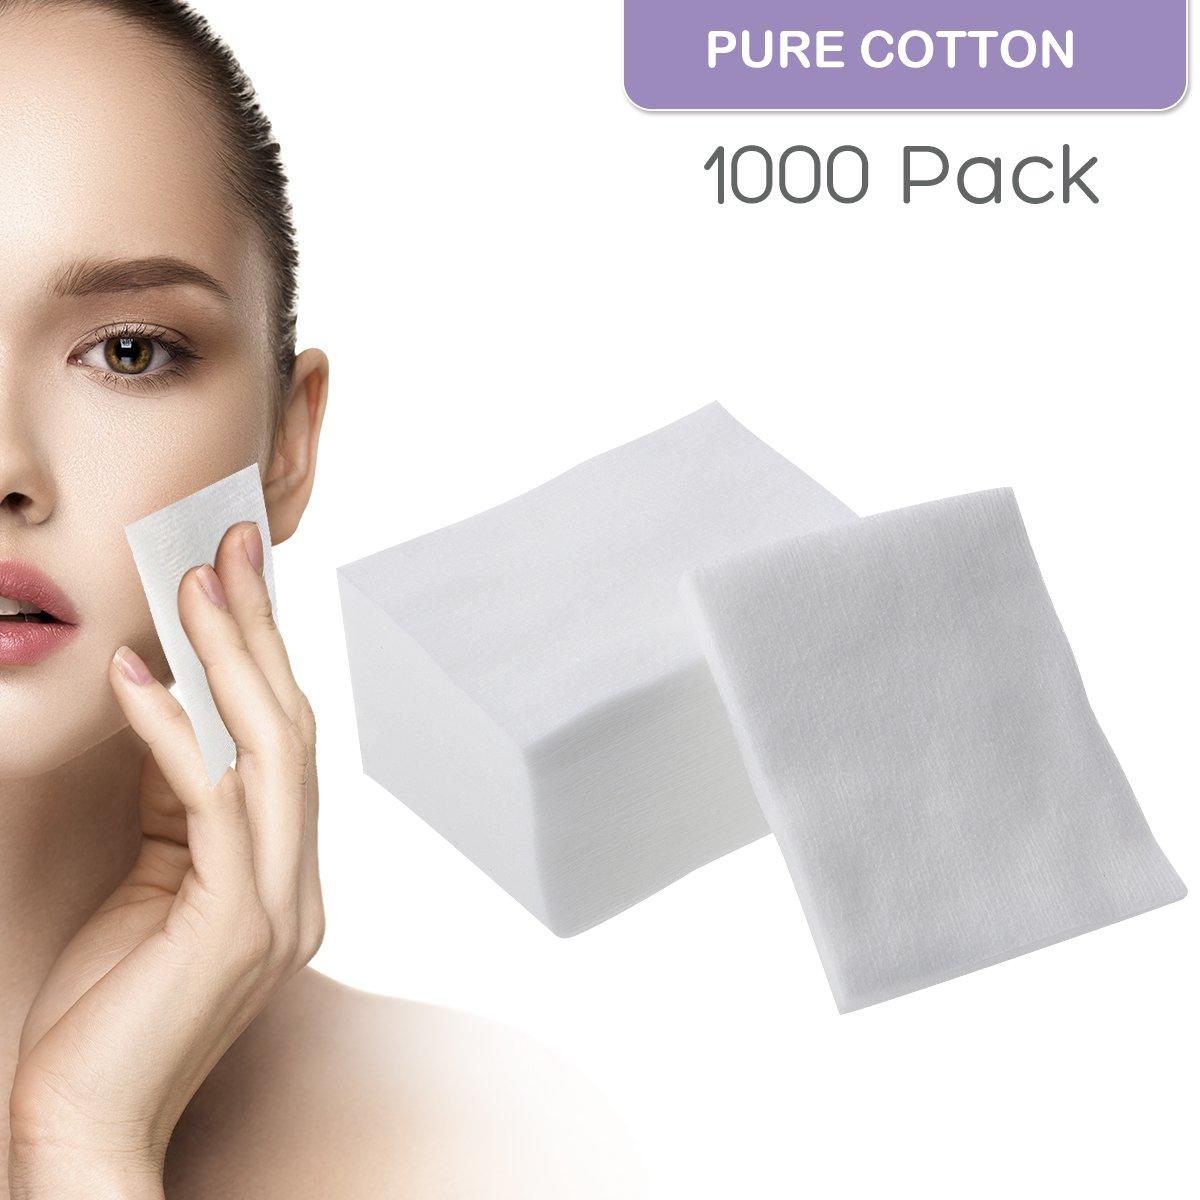 Los cojines de algodó n suaves faciales del maquillaje 1000pcs para la cara componen quitar Frcolor